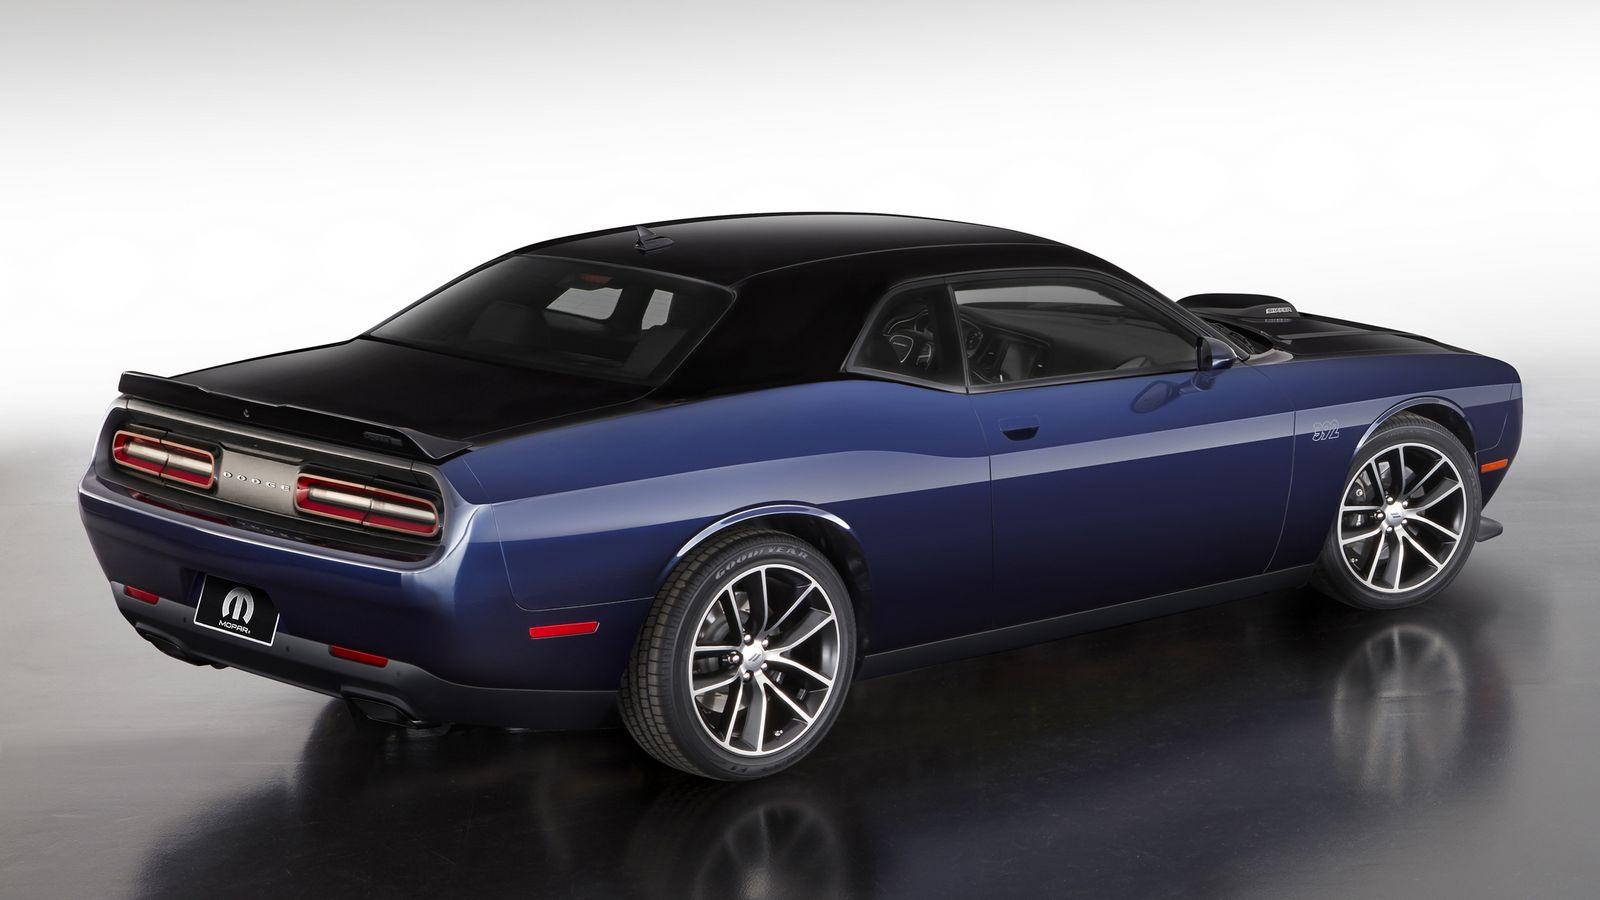 2014 - [Dodge] Challenger SRT - Page 3 2017%2BMopar%2BDodge%2BChallenger%2B-1